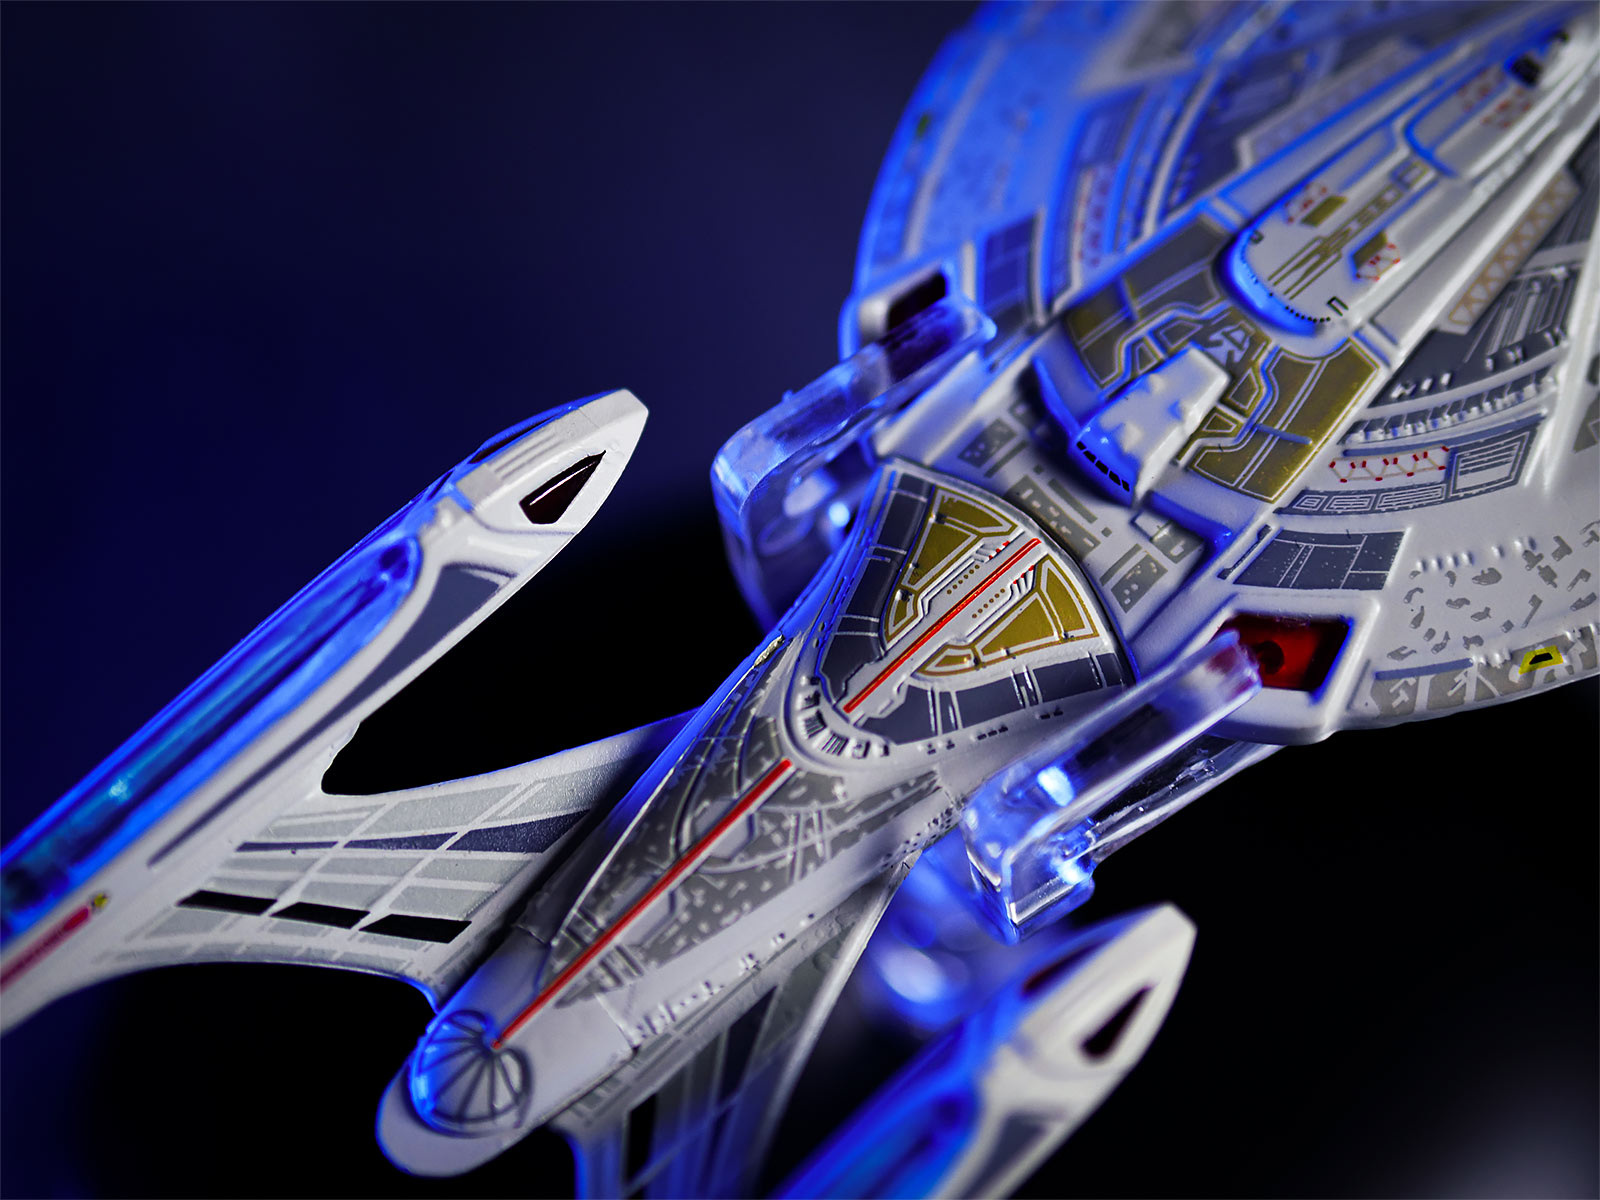 Star Trek - Raumschiff U.S.S. Enterprise NCC-1701-E Hero Collector Figur